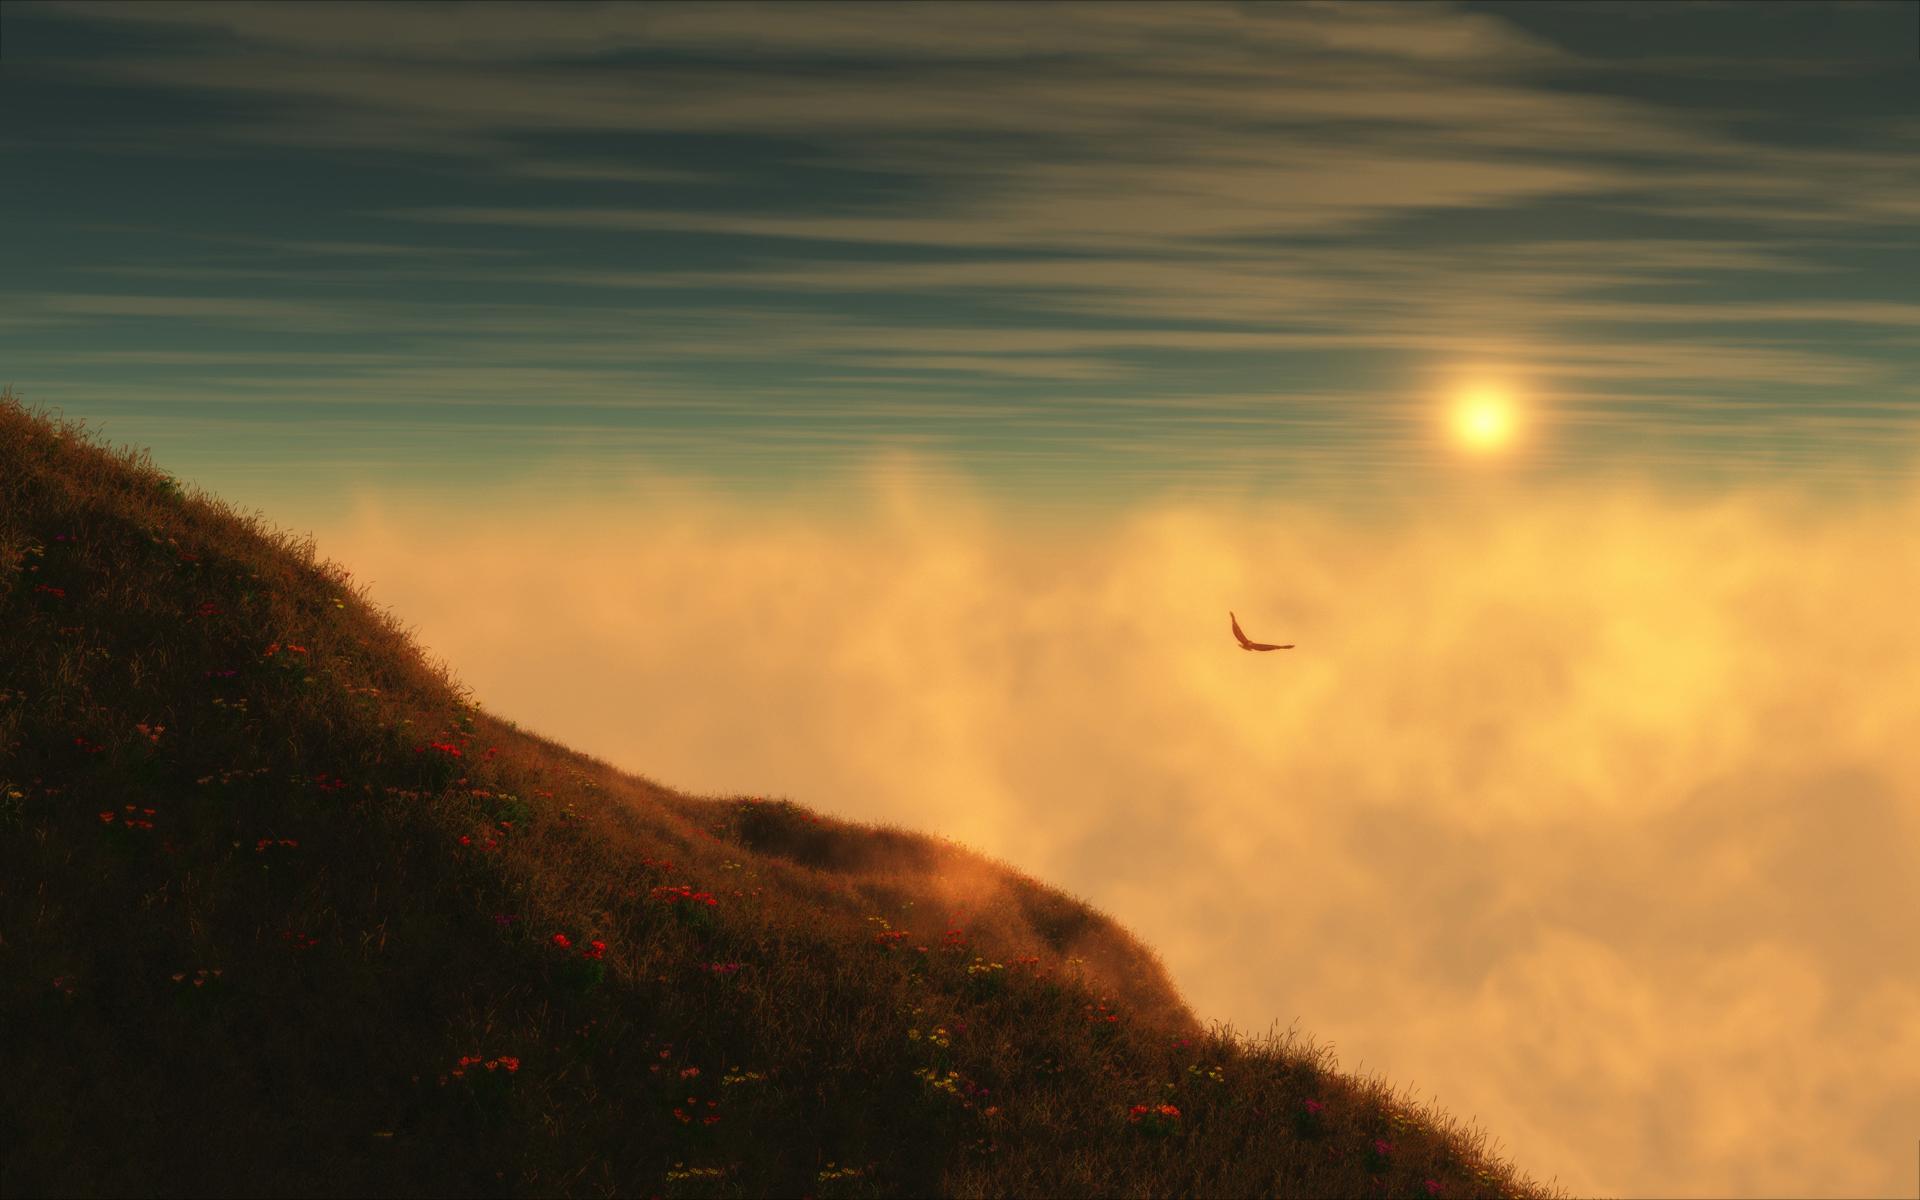 Sky hill flying eagle